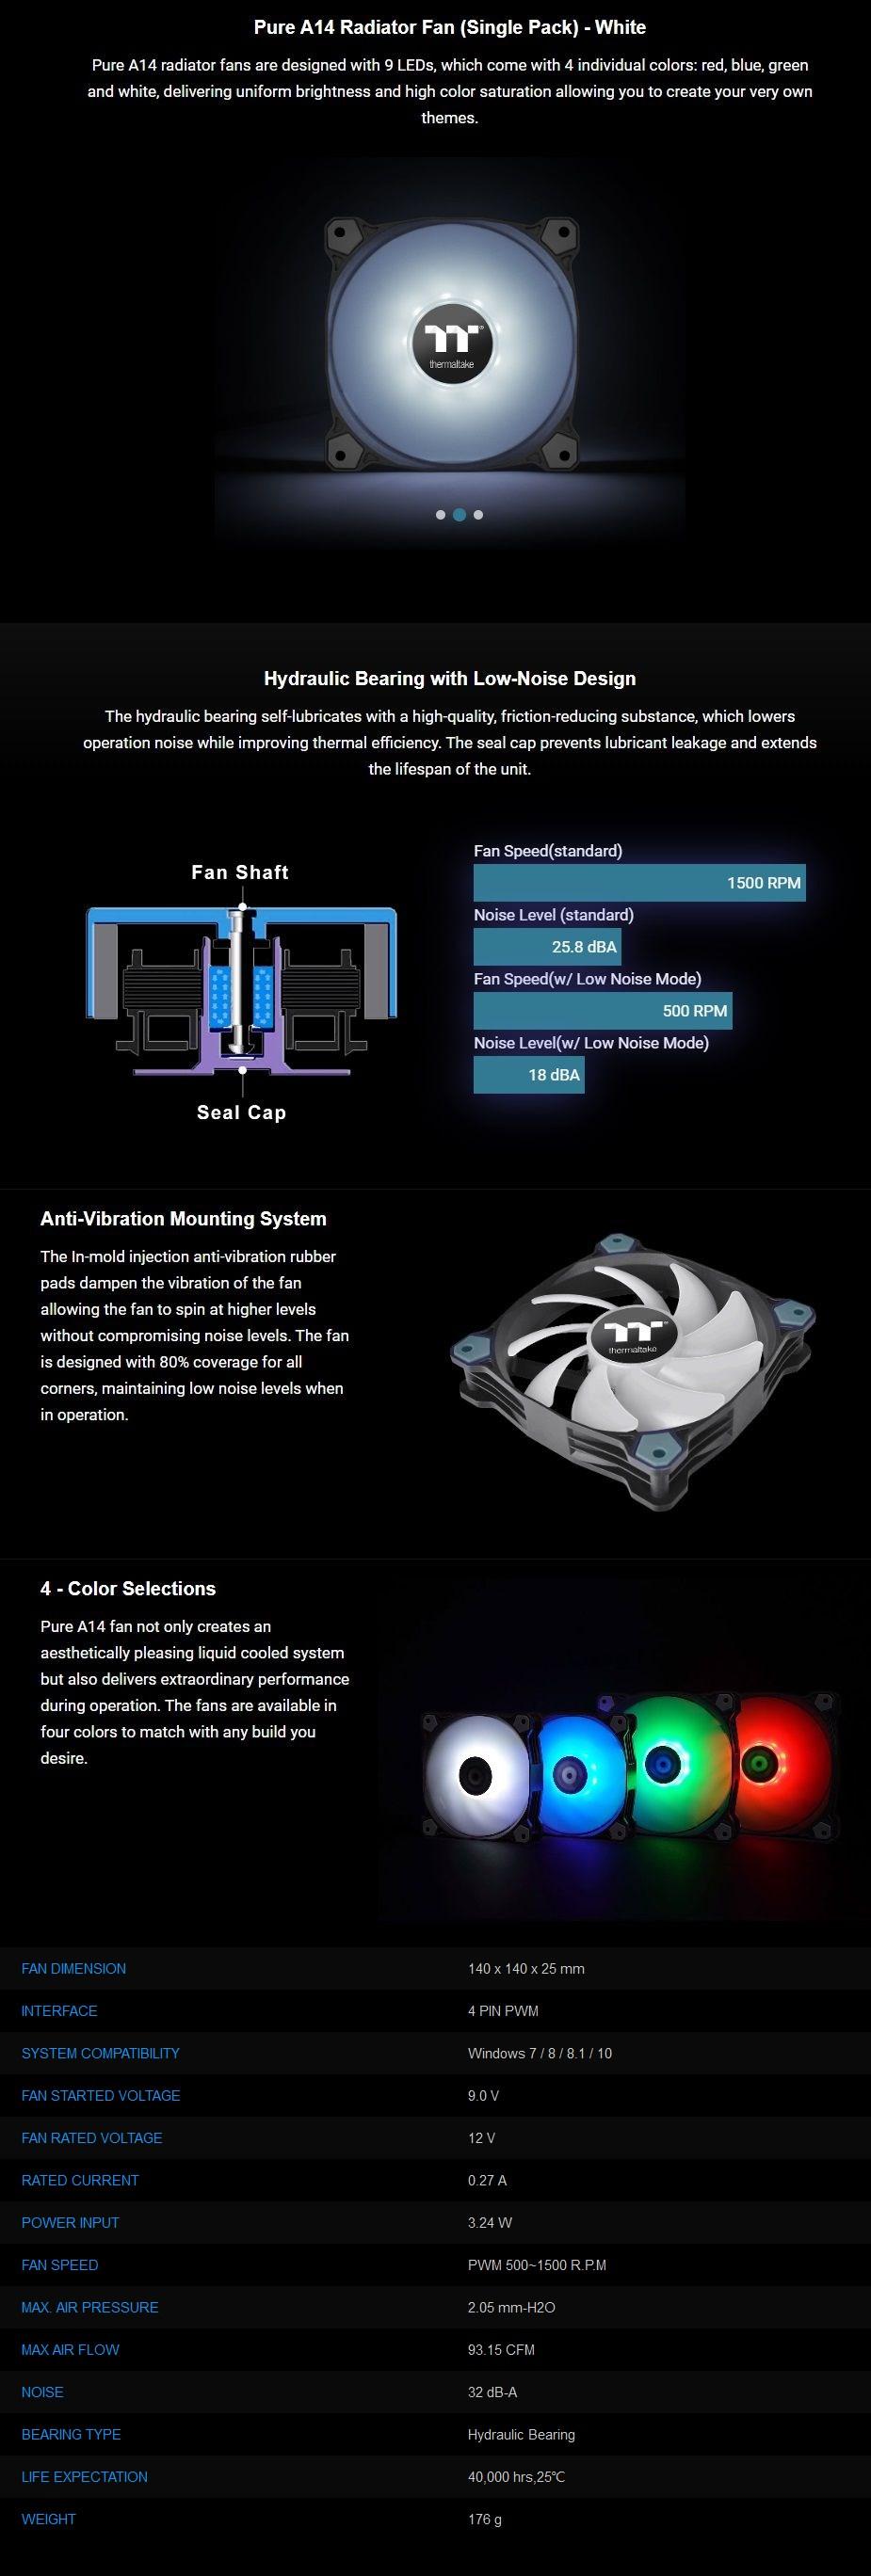 thermaltake-pure-a14-140mm-led-radiator-fan-white-ac37137-2-.jpg